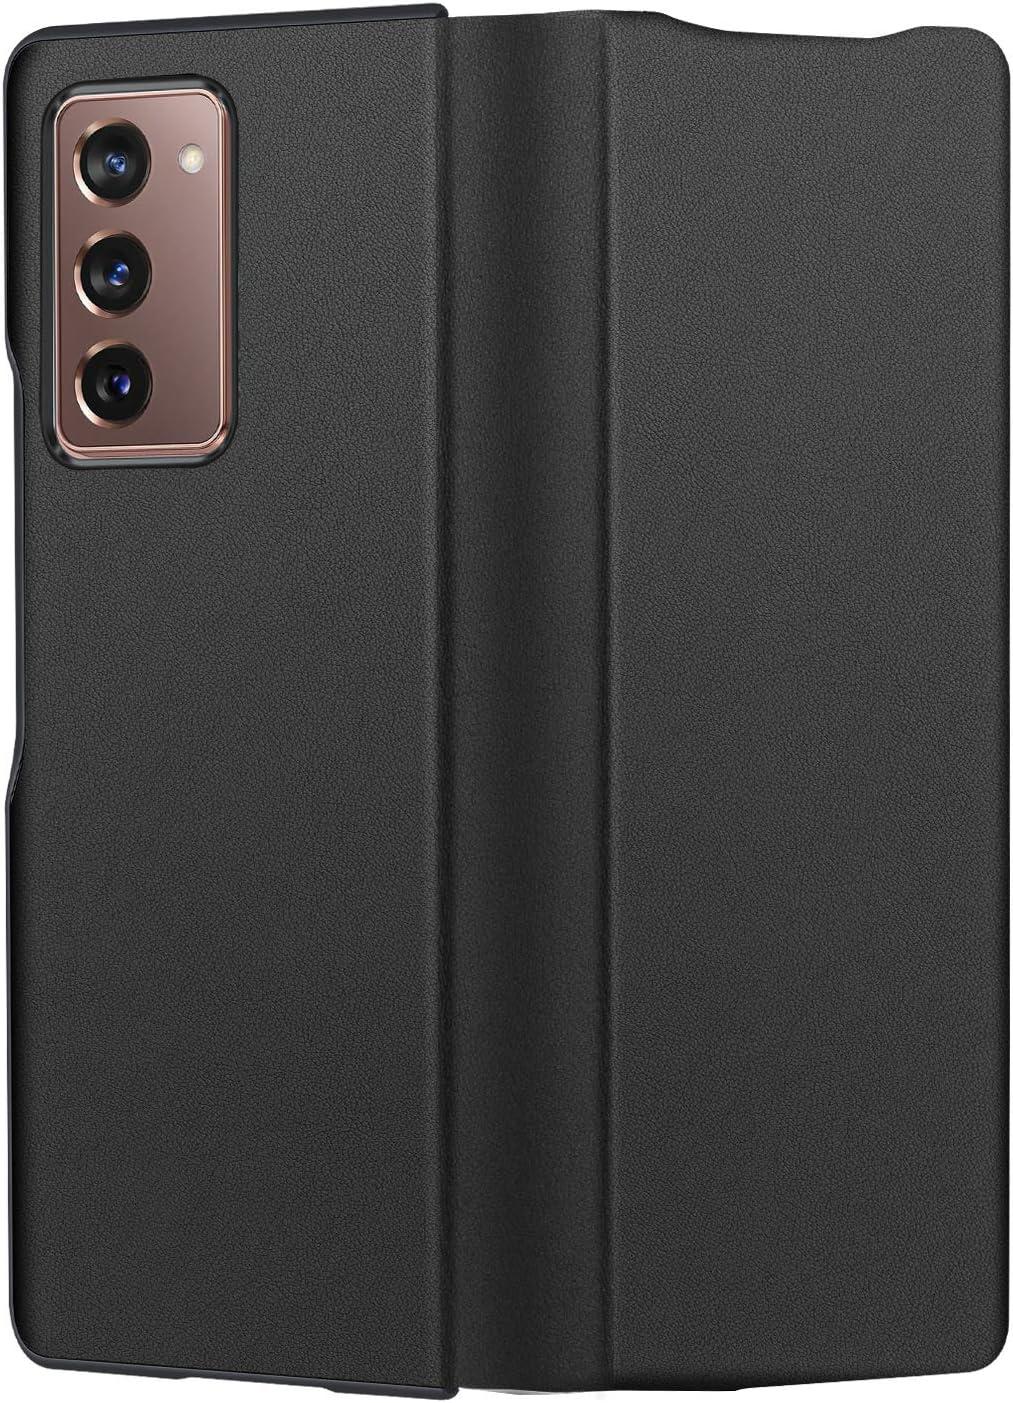 CENMASO Designed for Galaxy Fold 2 Case, Ultra-Thin Leather Magnetic Flip Case for Samsung Galaxy z Fold 2 5G- Black